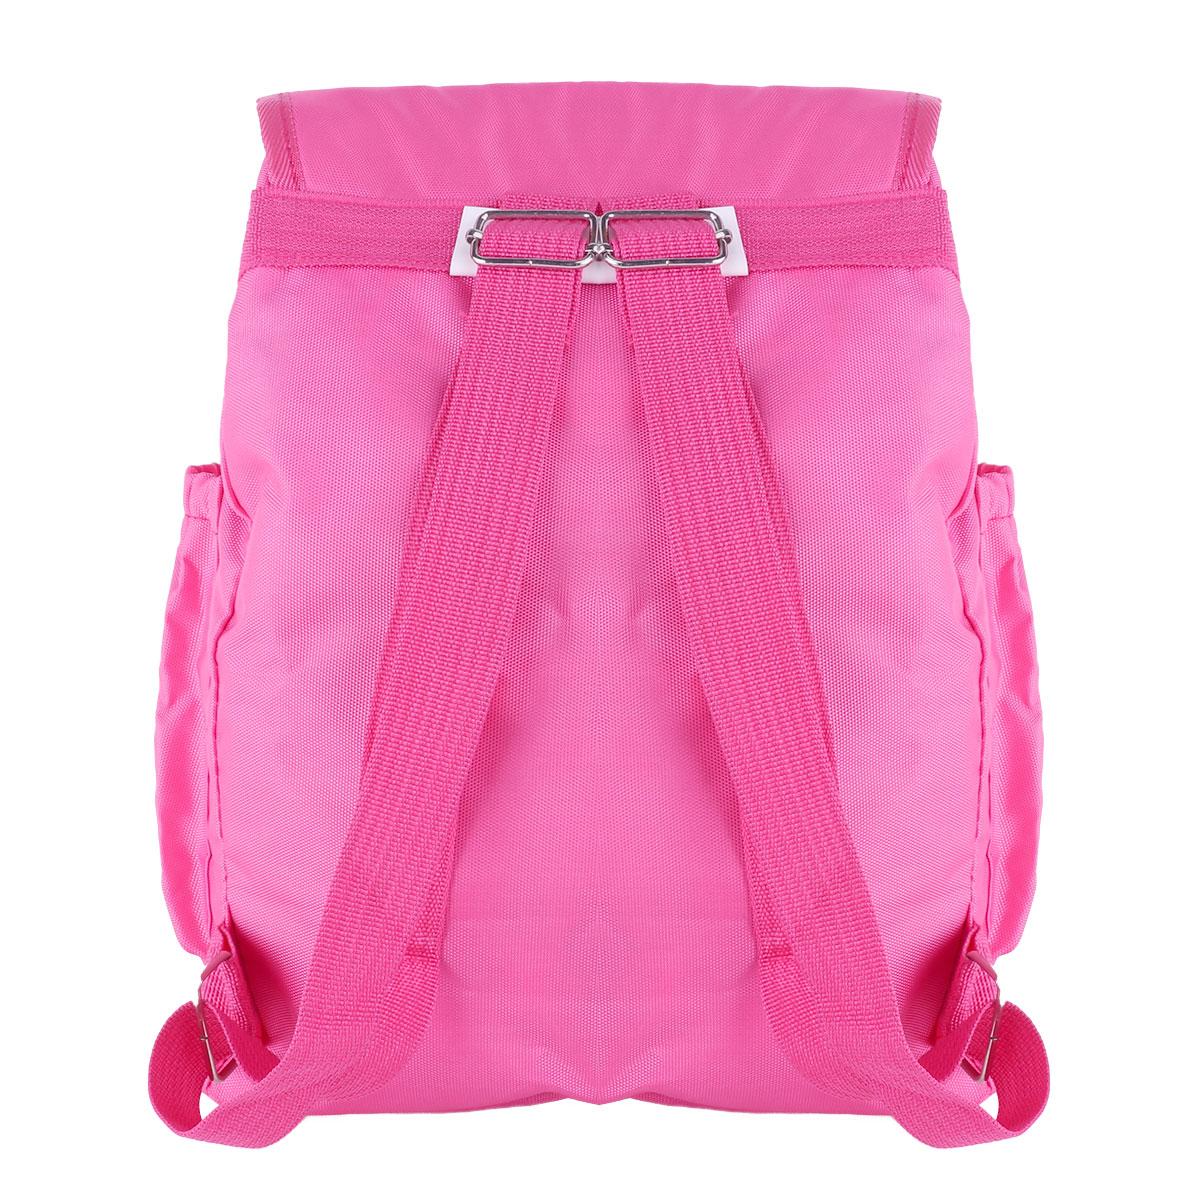 8a0e242db Detail Feedback Questions about Fashion Cute Child Kids Ballet Bag ...